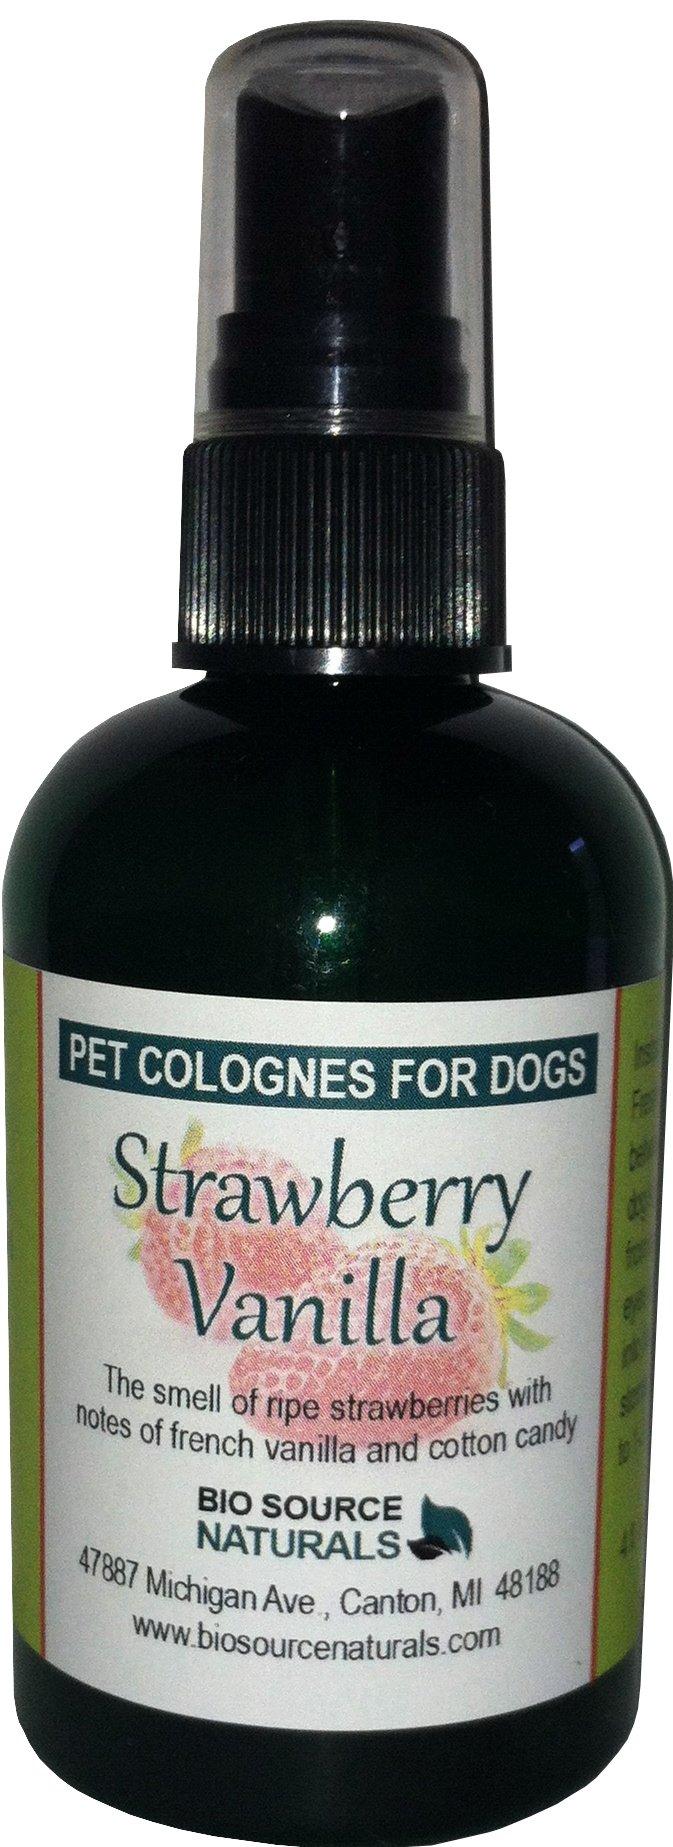 Strawberry Vanilla Pet - Dog Cologne Spray (4 oz/ 120 ml)